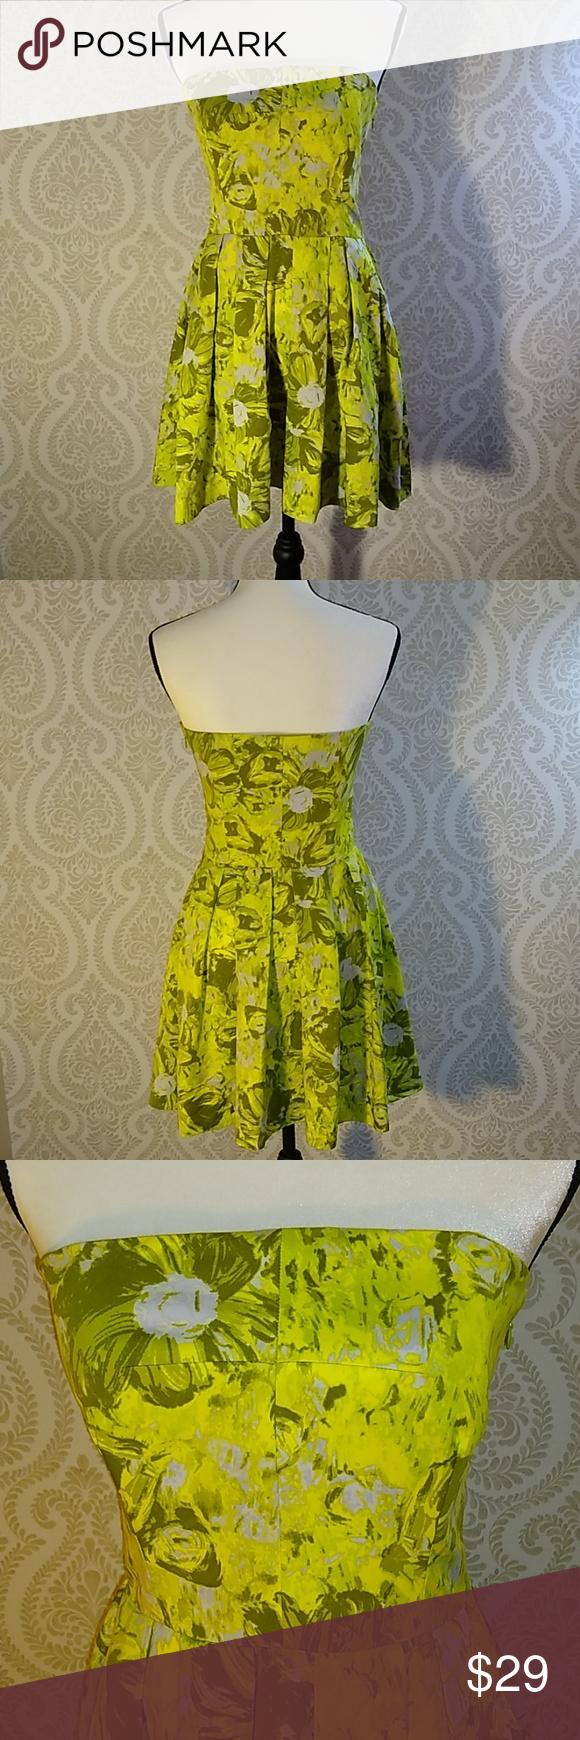 Season 5 Yellow Dress Rachel Green Outfits Rachel Green Style Friends Rachel Outfits [ 1080 x 1920 Pixel ]